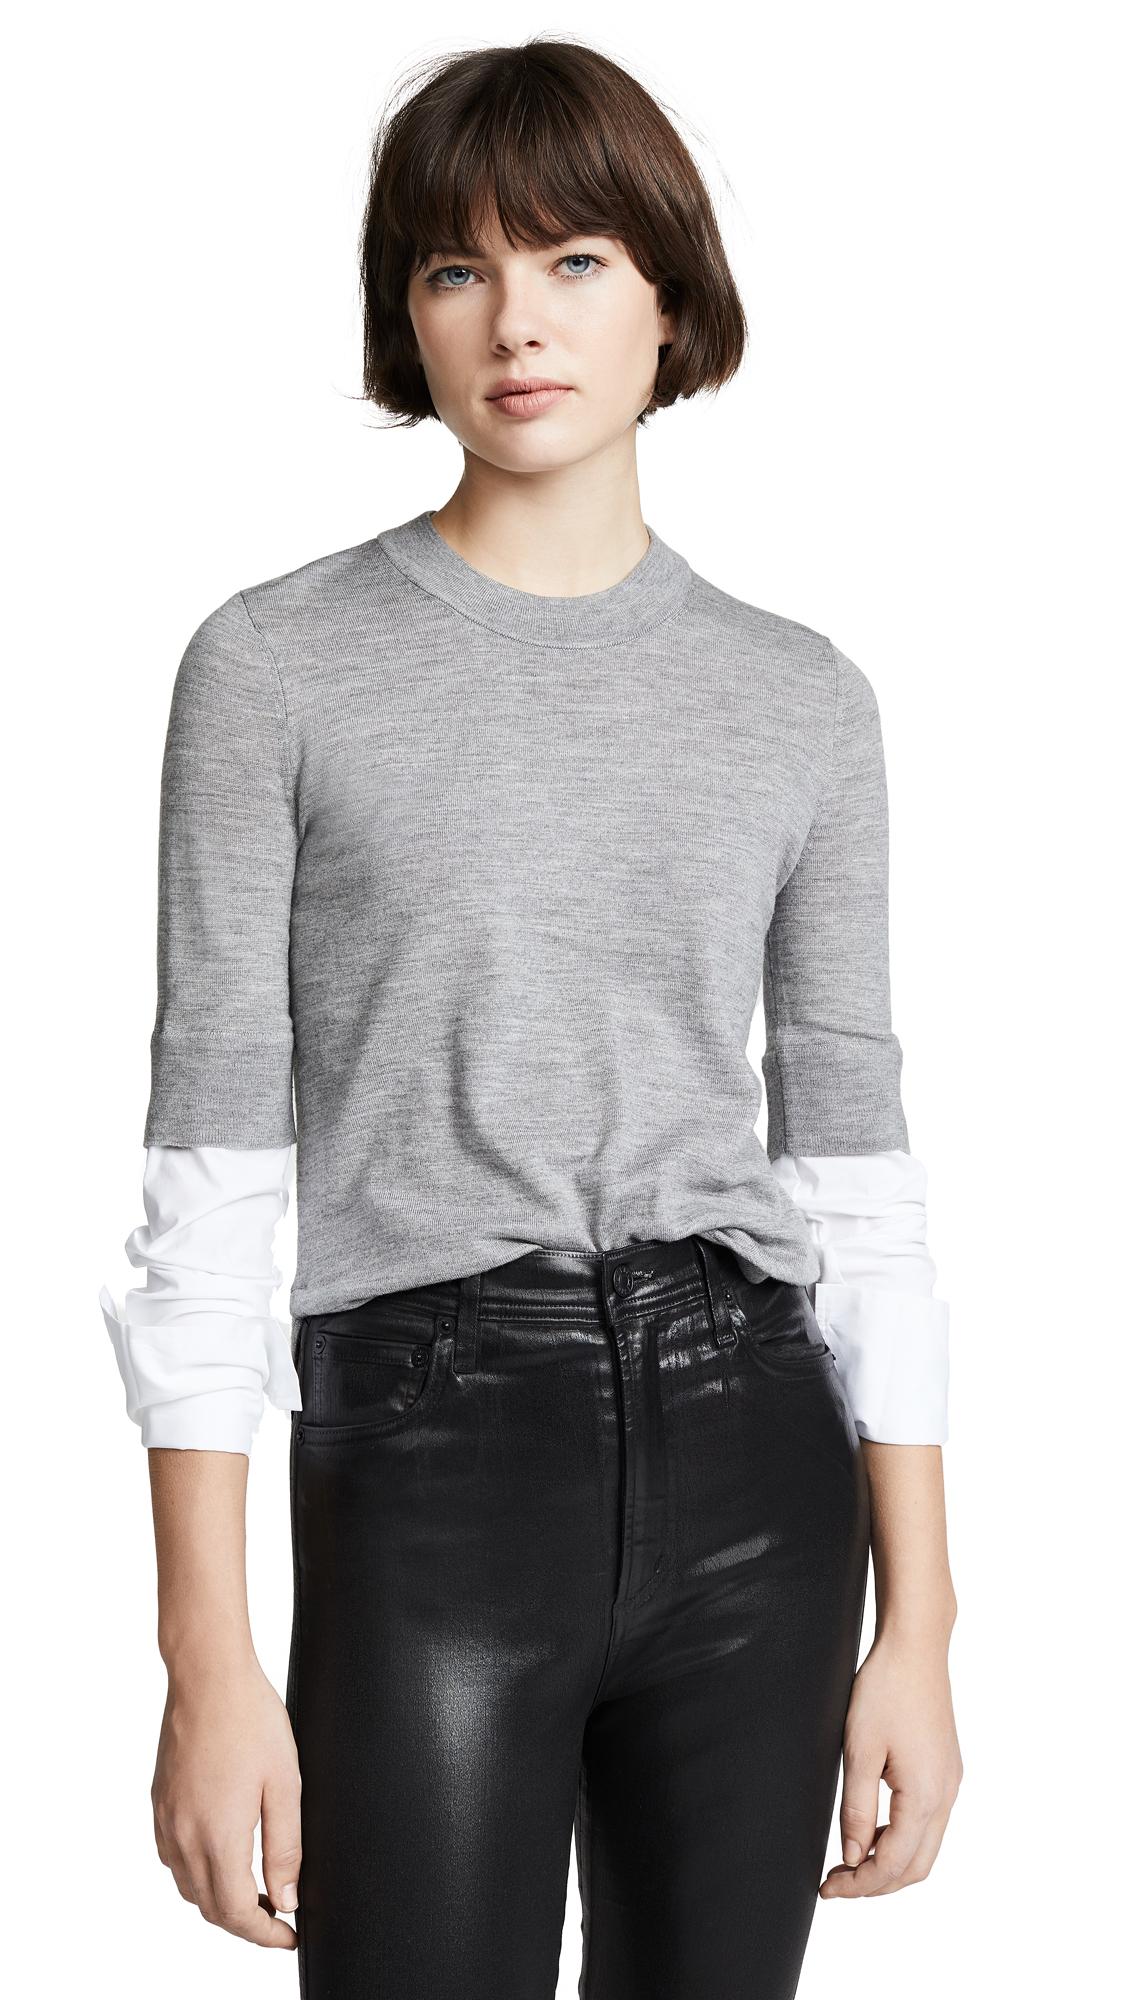 Roscoe Crewneck Wool Sweater With Plaid Sleeves in Grey Melange